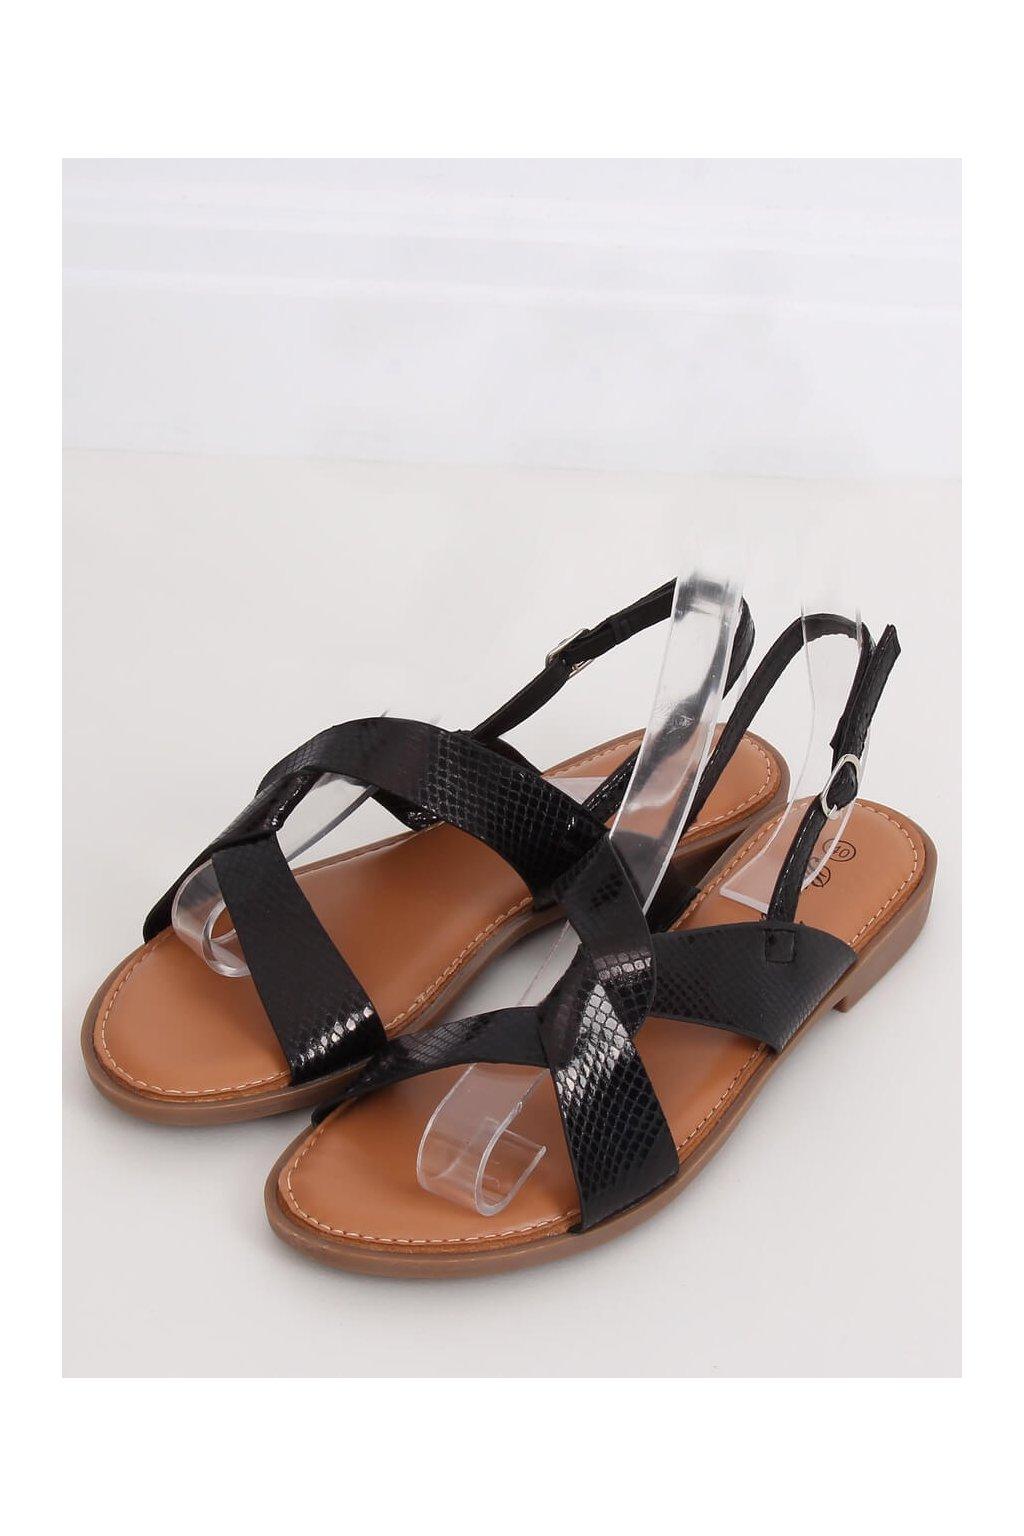 Ćierne sandále Renda kod 222-31 BLK